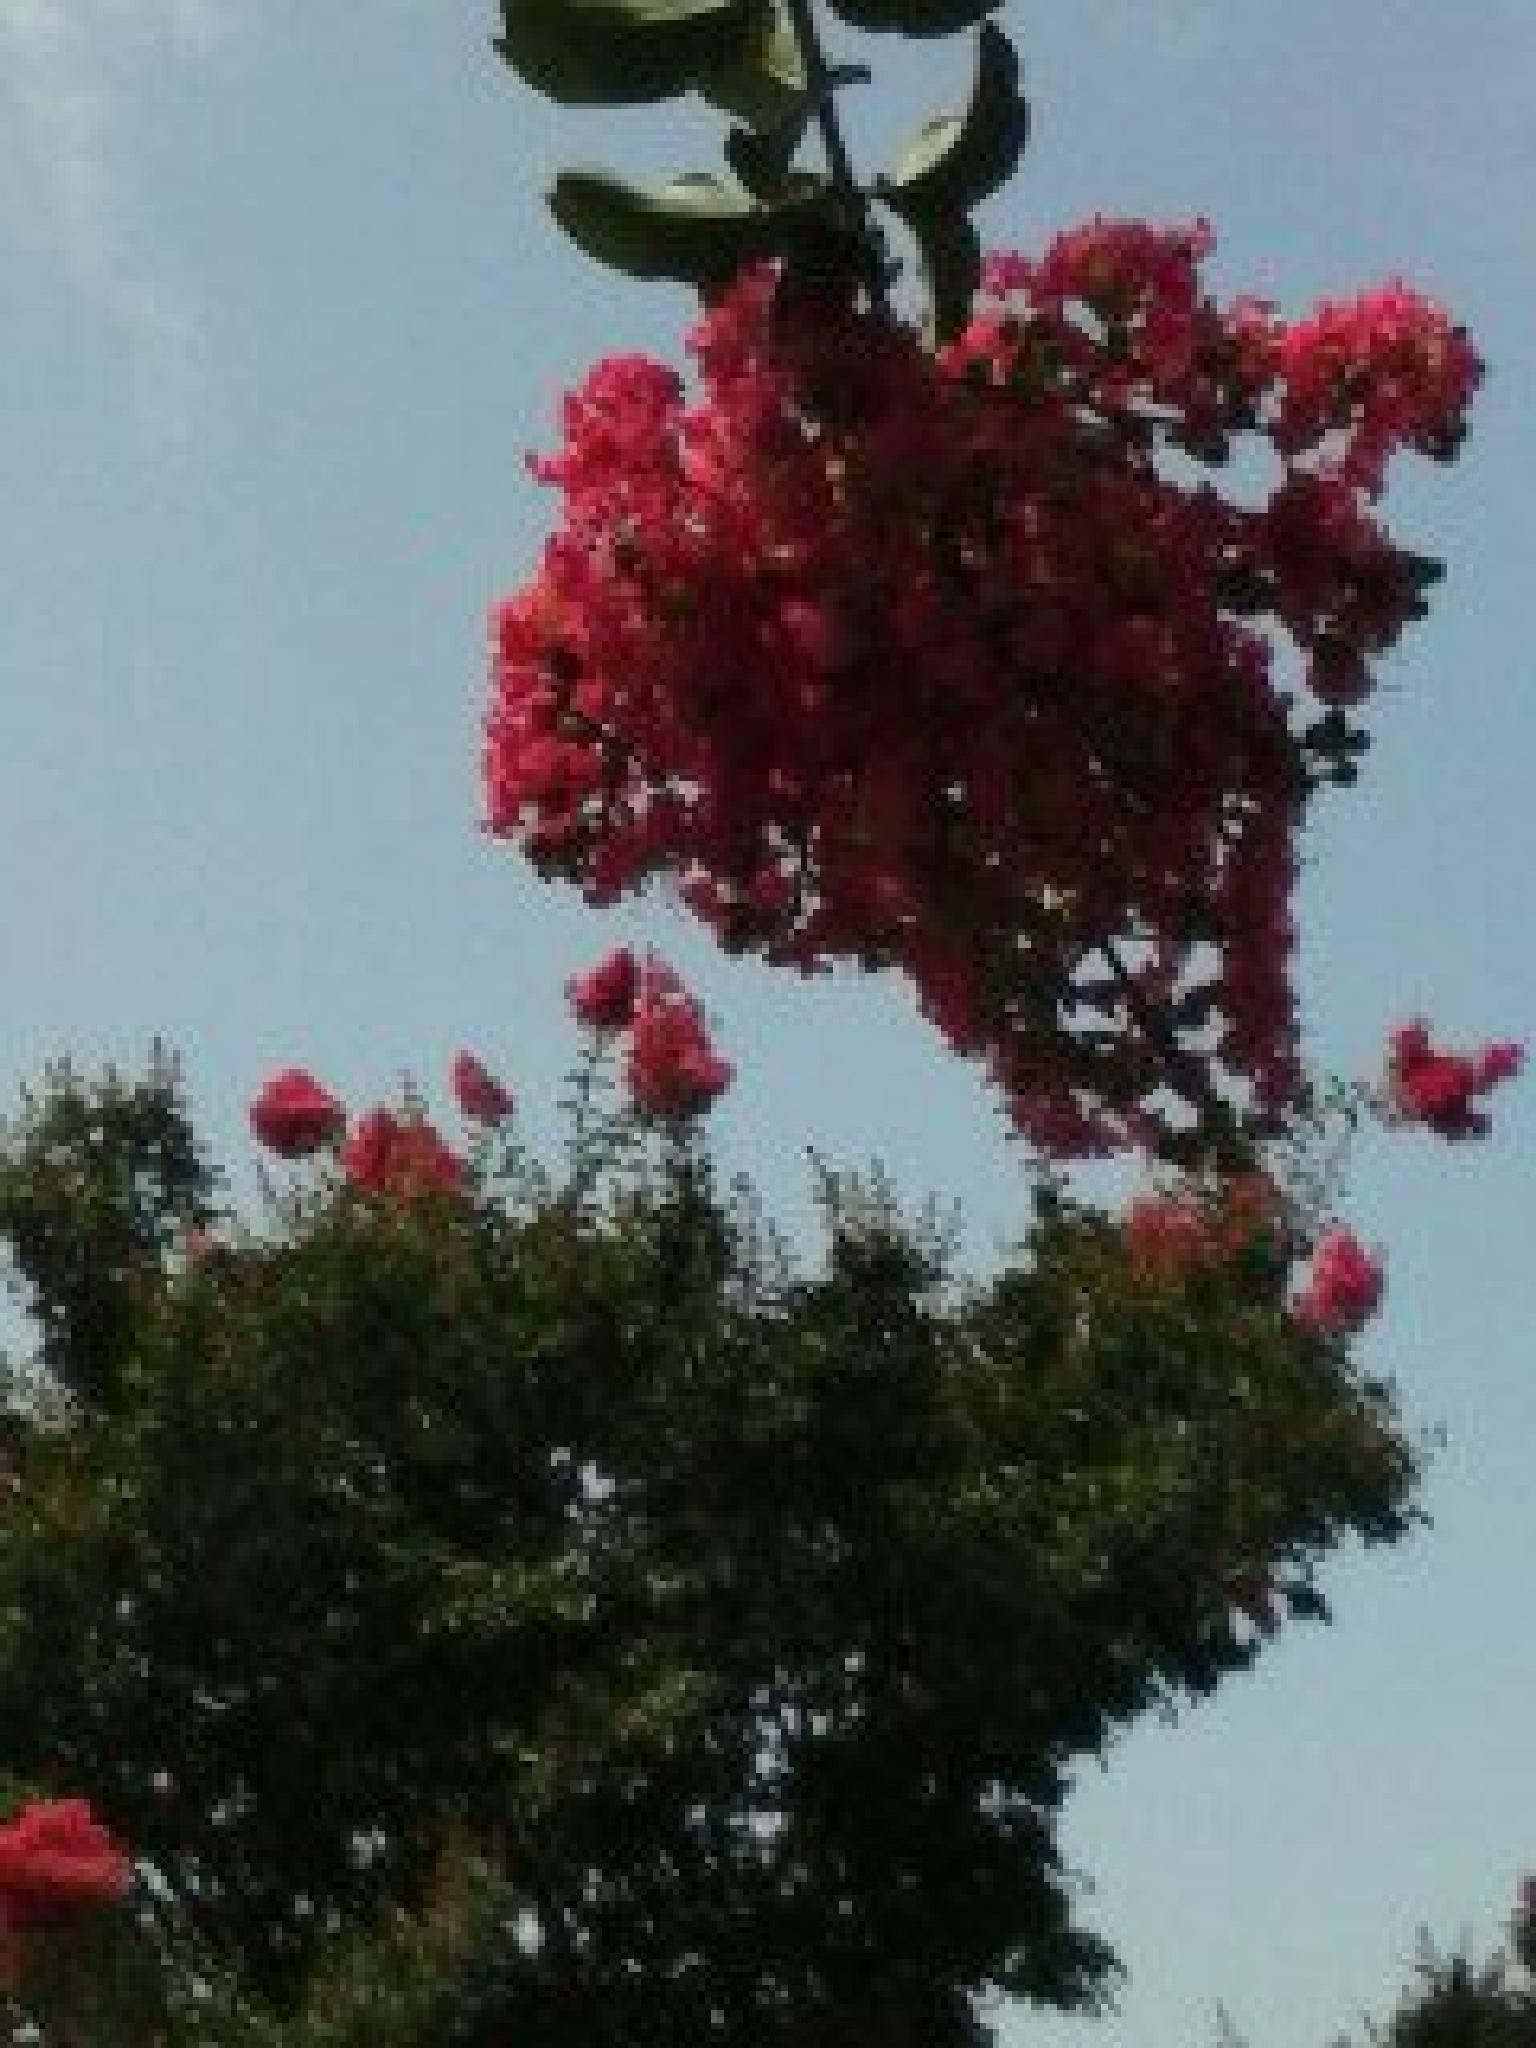 Crape Myrtle tree by deniseshull.hardenburg